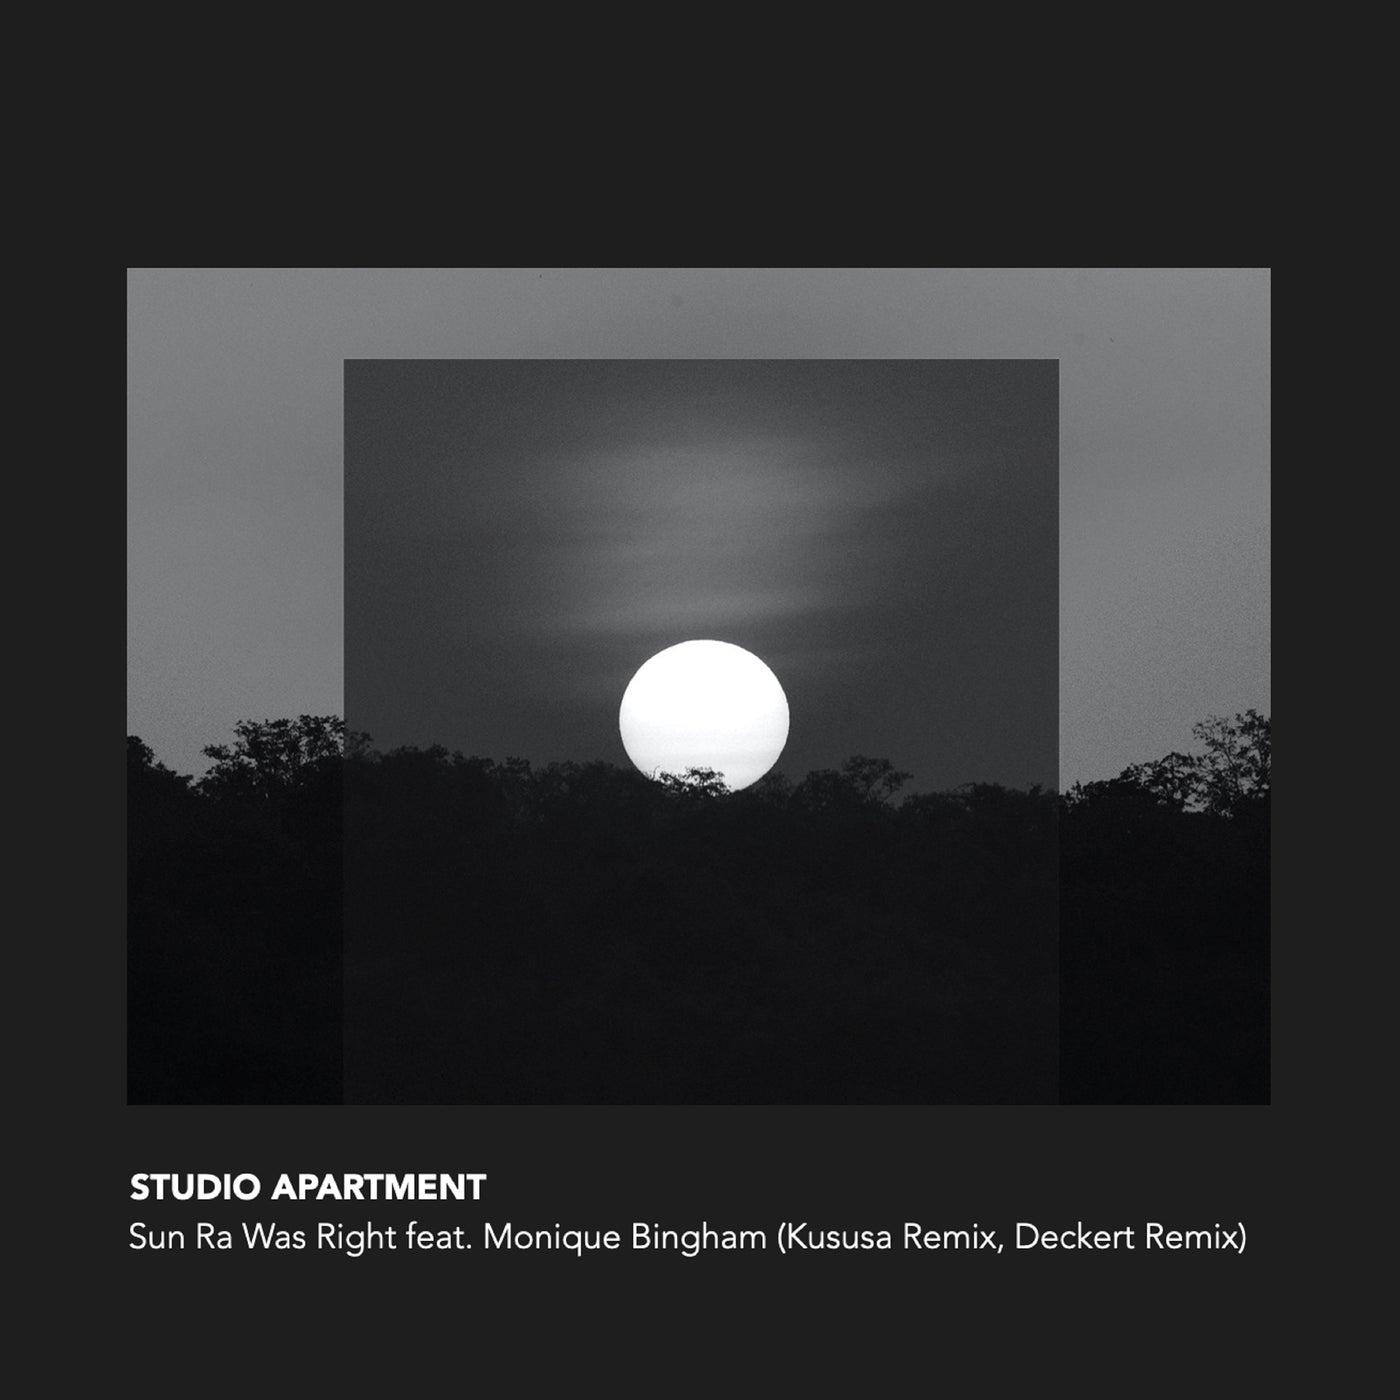 Sun Ra Was Right (Kususa Remix)